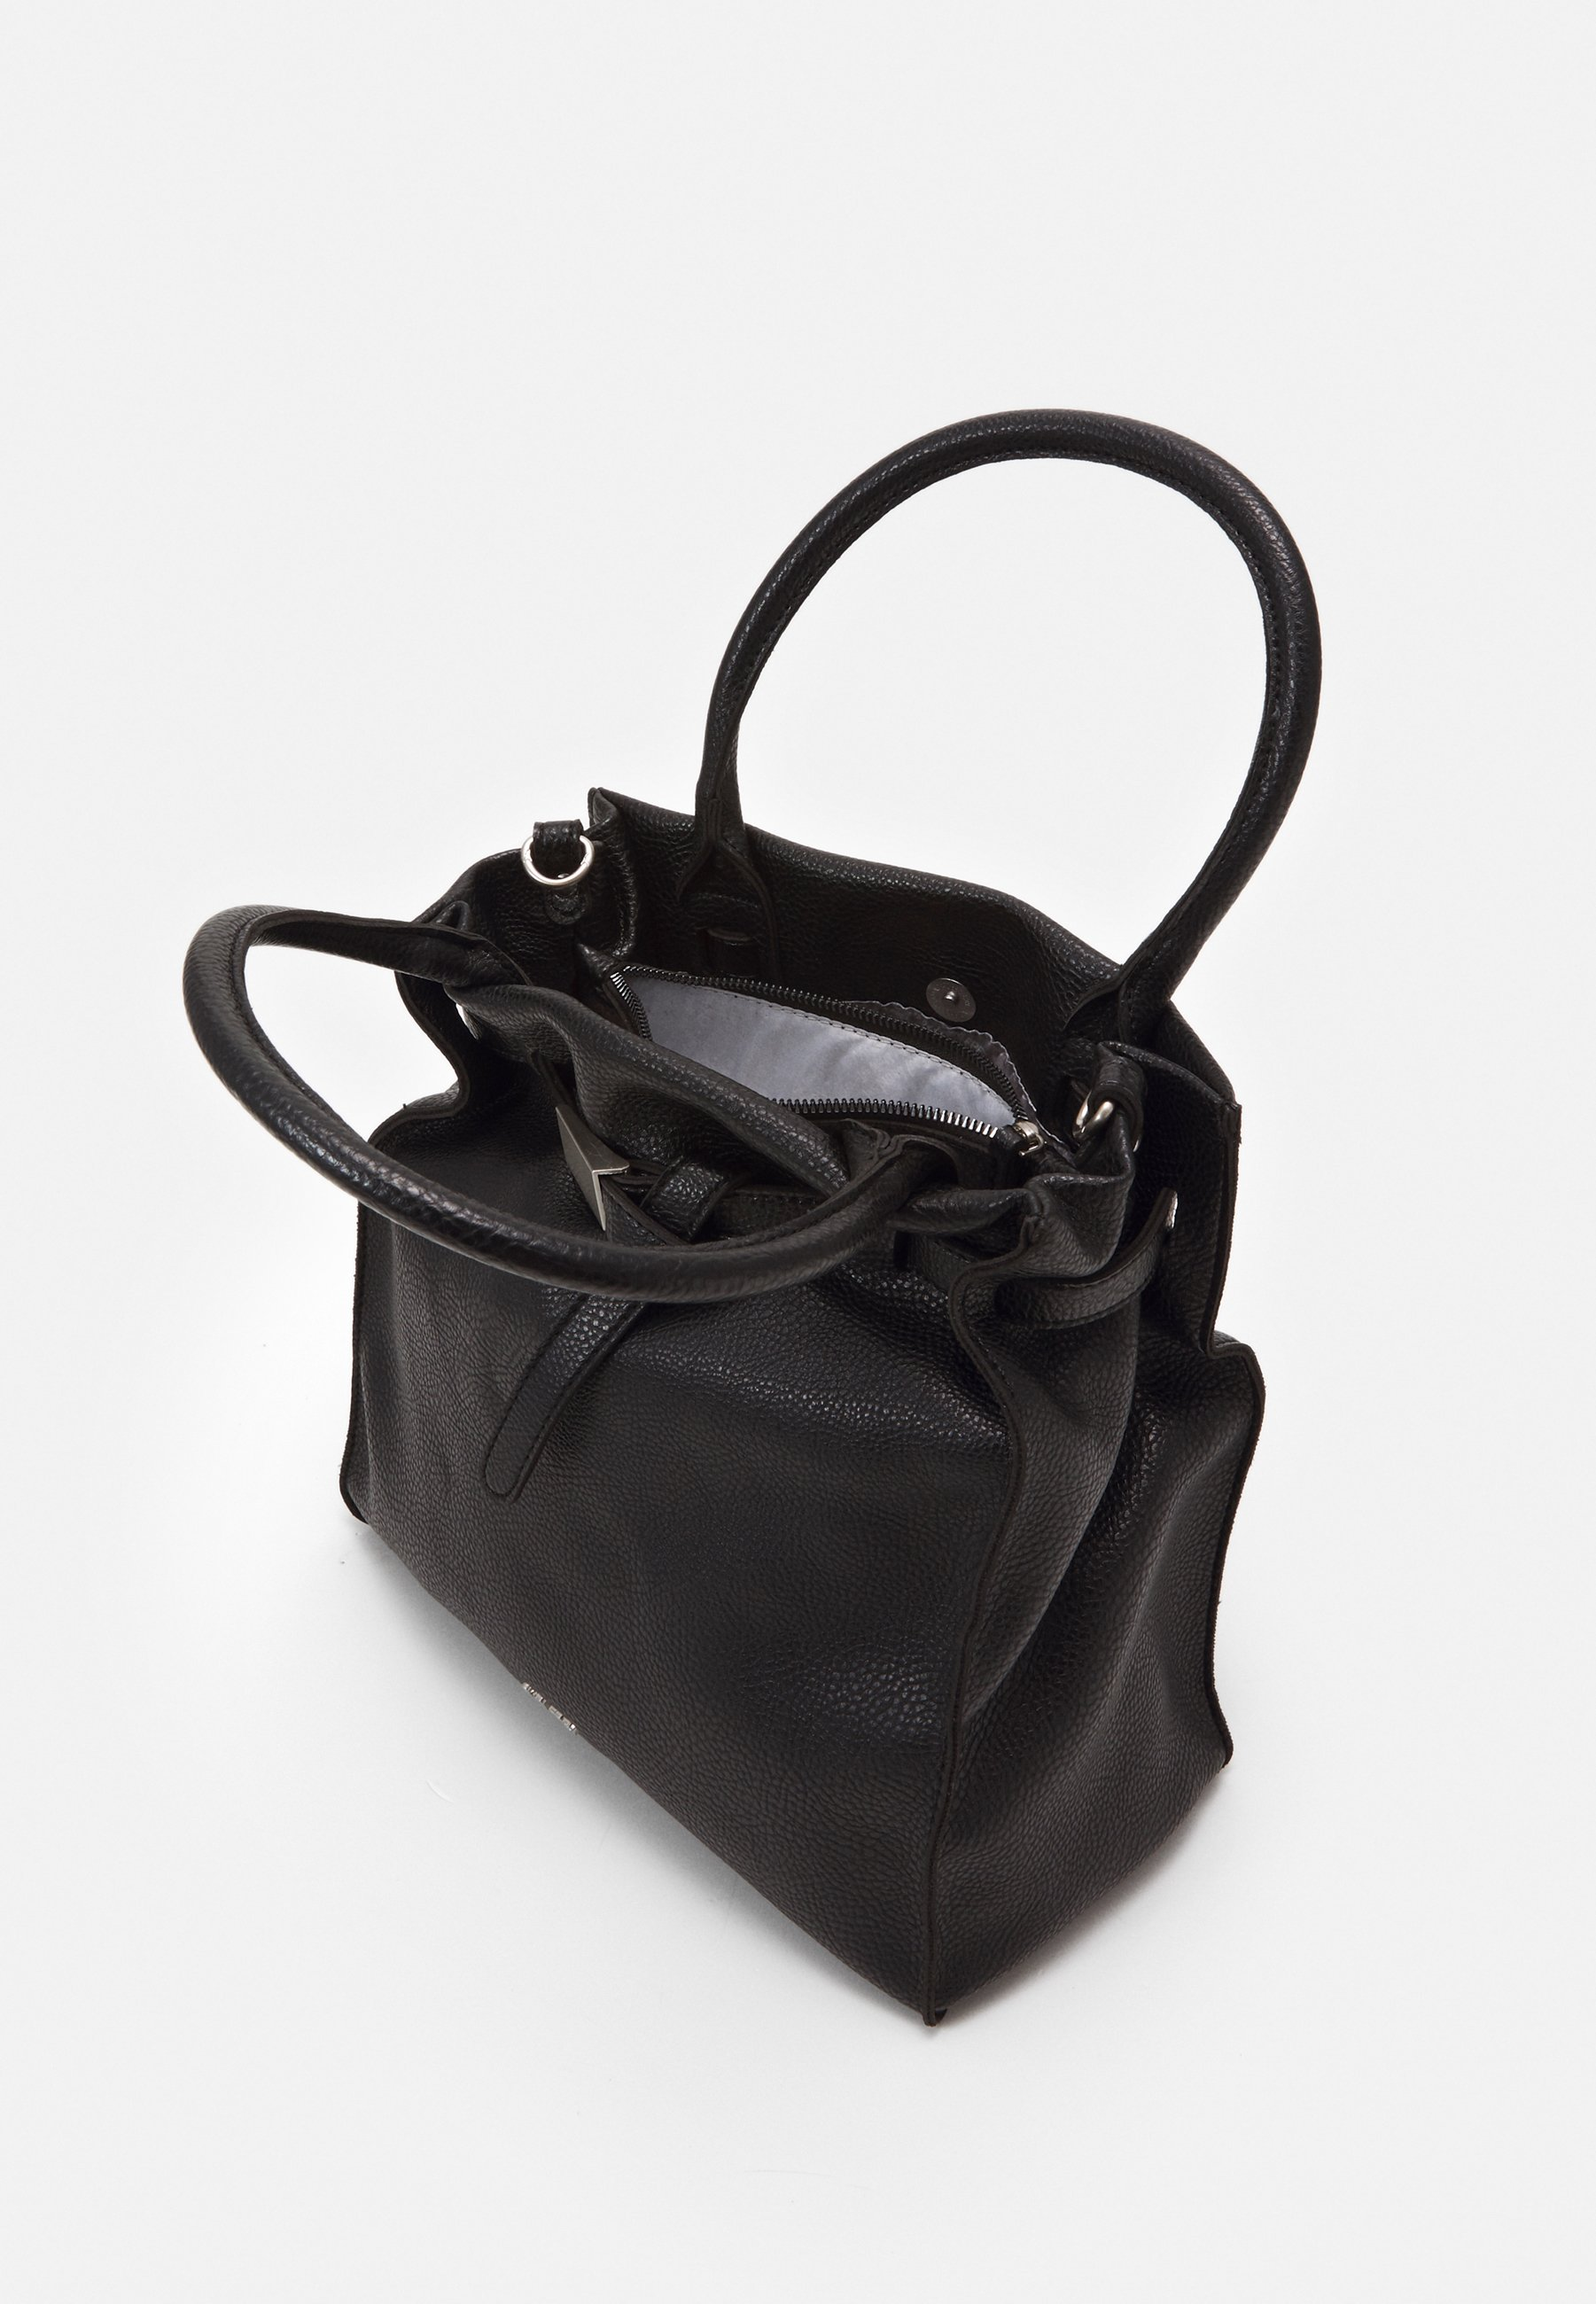 A hoy SURI FREY SINDY - Bolso de mano - black | Complementos para mujer 2020 dcWEs